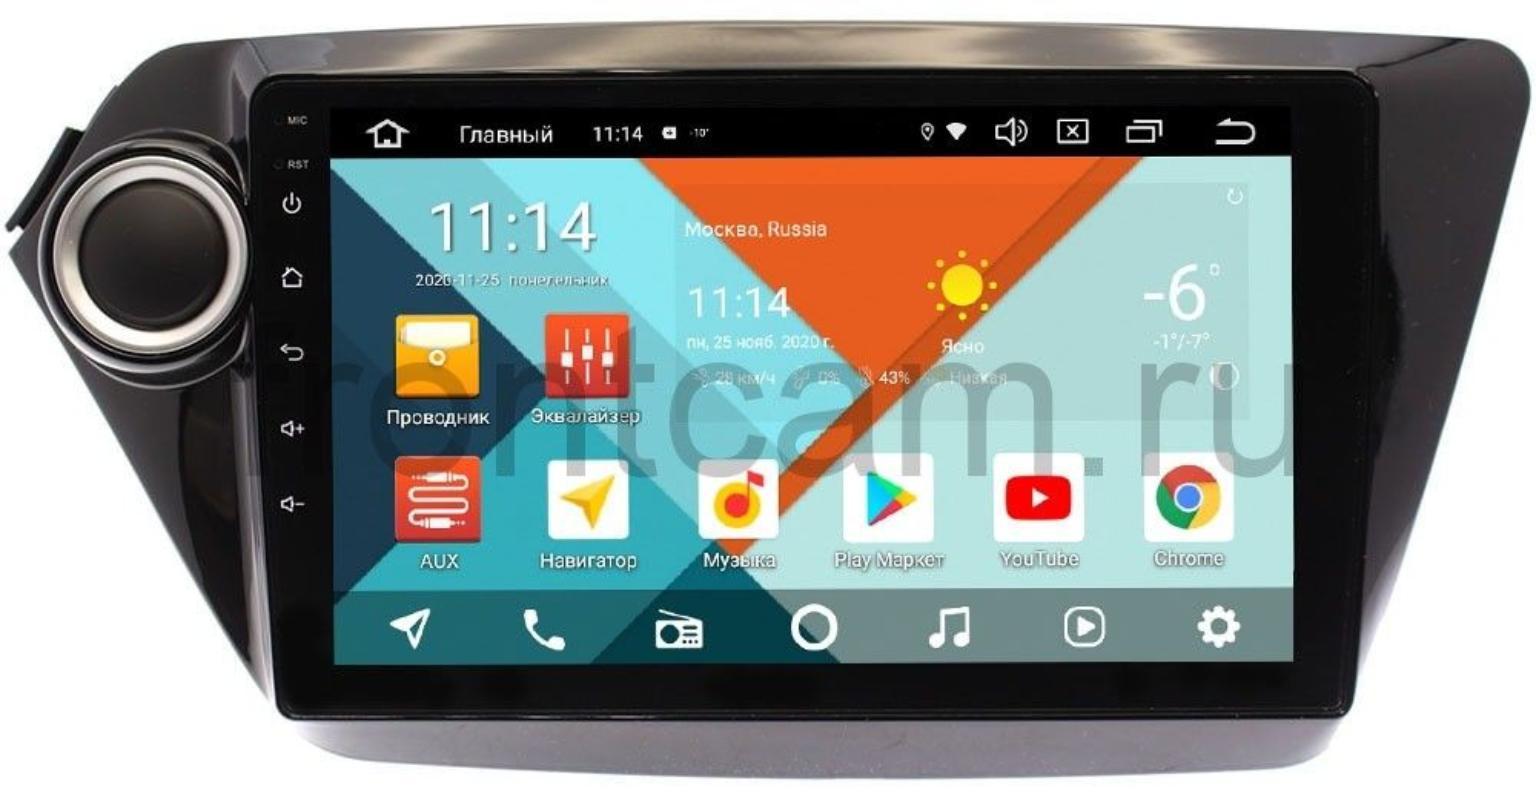 Штатная магнитола Kia Rio III 2011-2017 Wide Media KS9011QR-3/32 DSP CarPlay 4G-SIM на Android 10 (+ Камера заднего вида в подарок!)